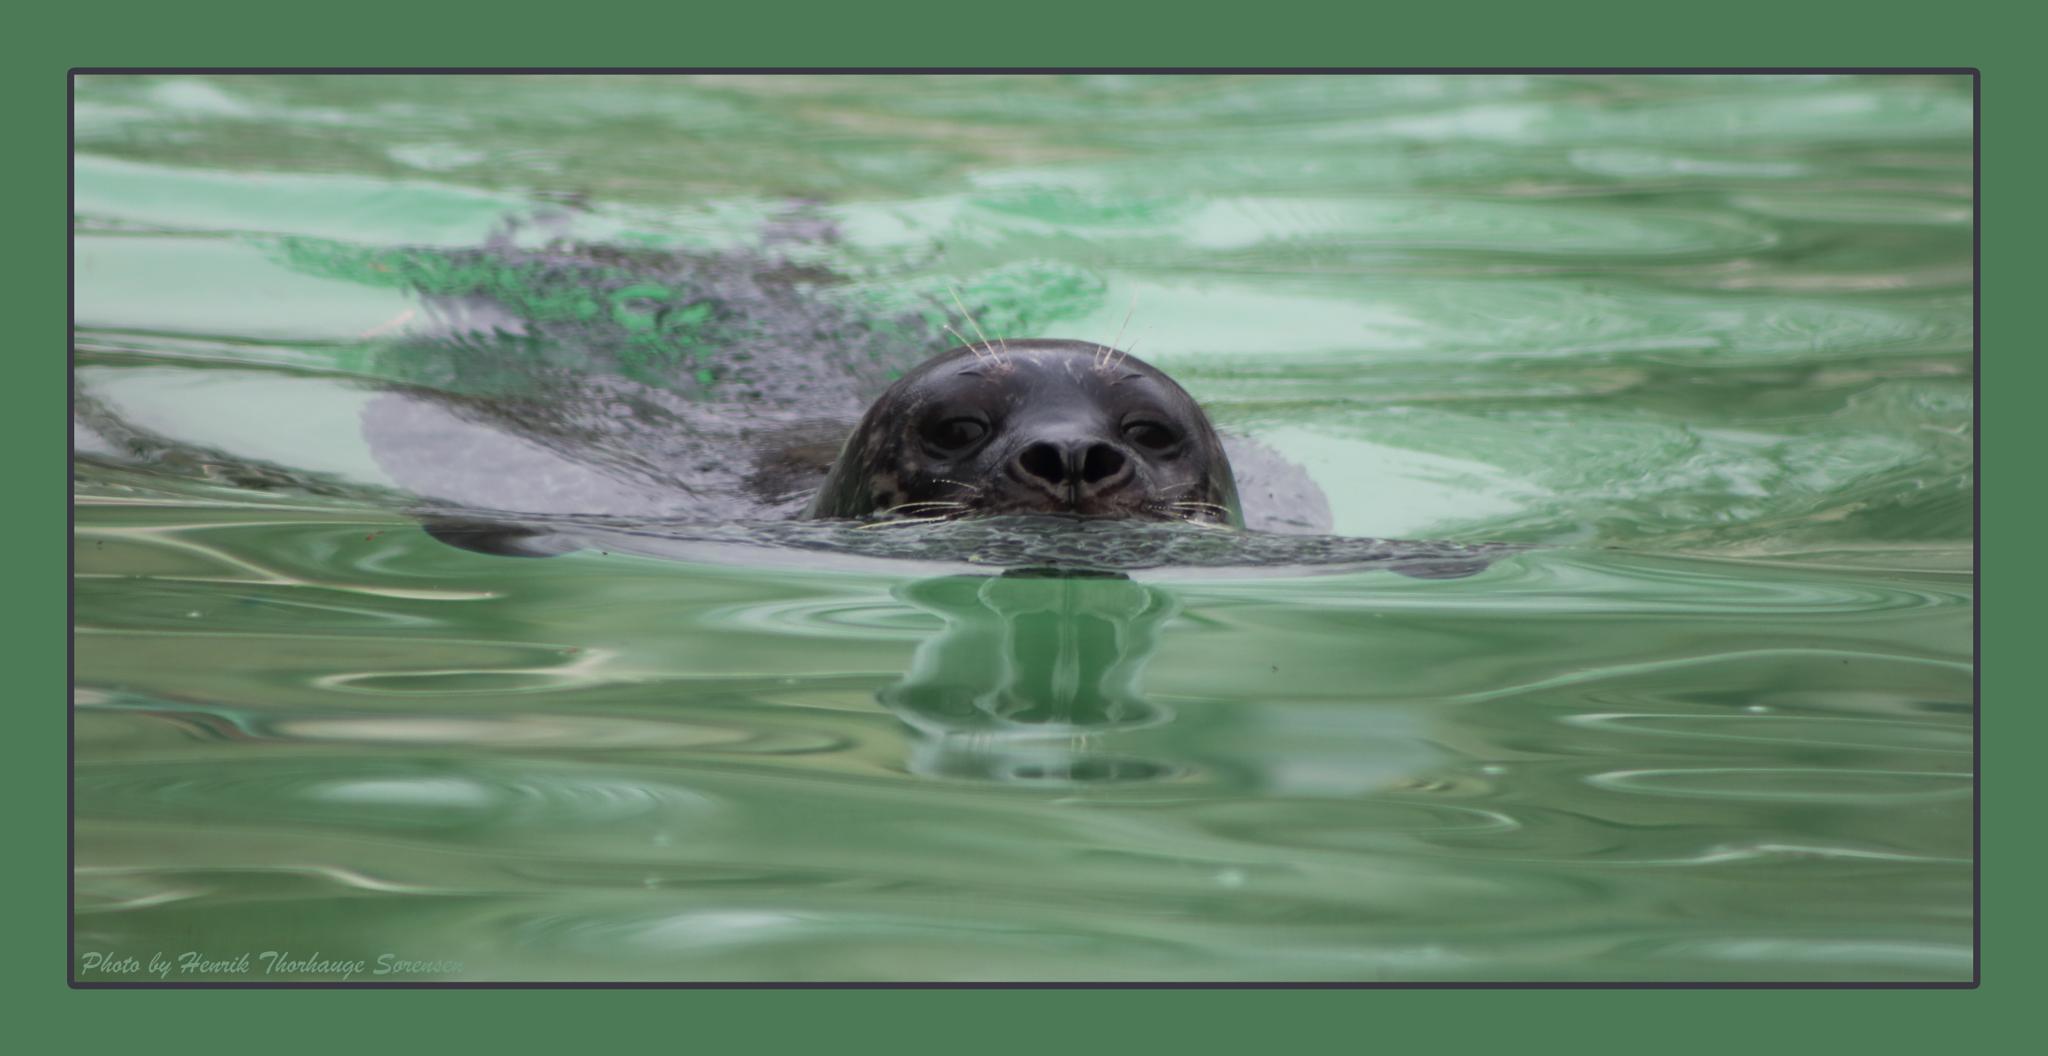 Seal by Henrik T. Sørensen